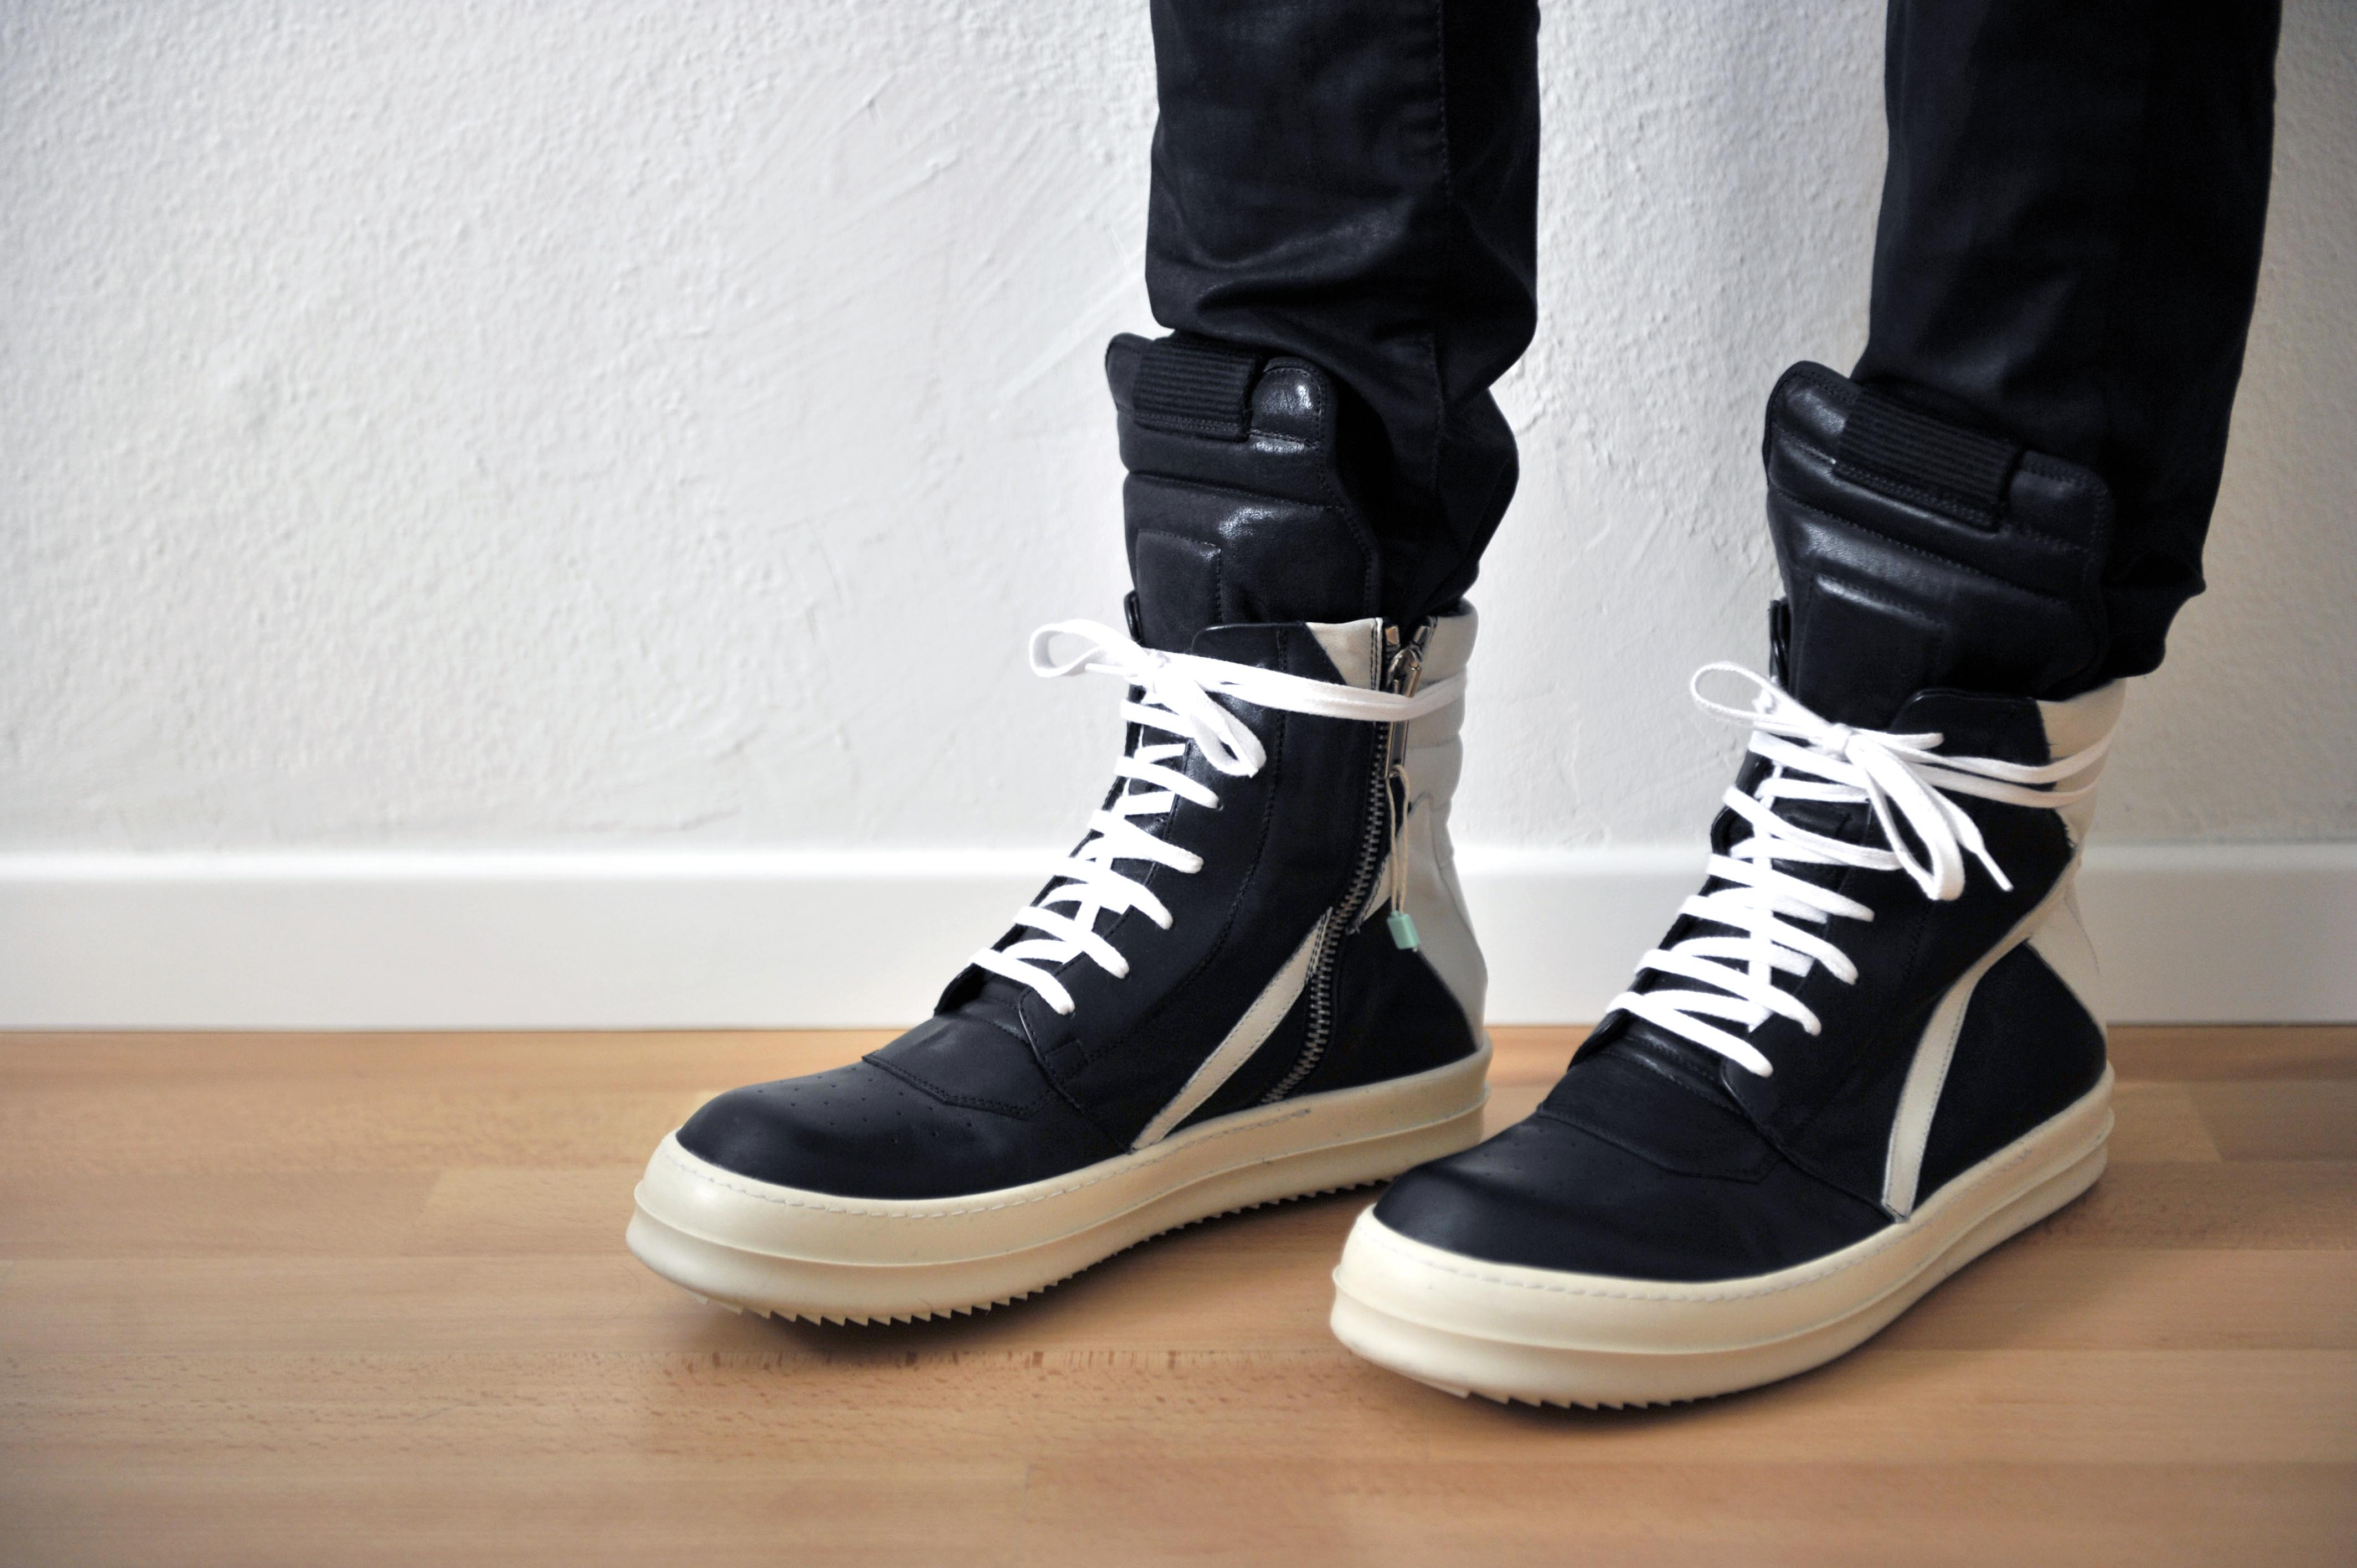 fashion sneakers weallsave. Black Bedroom Furniture Sets. Home Design Ideas